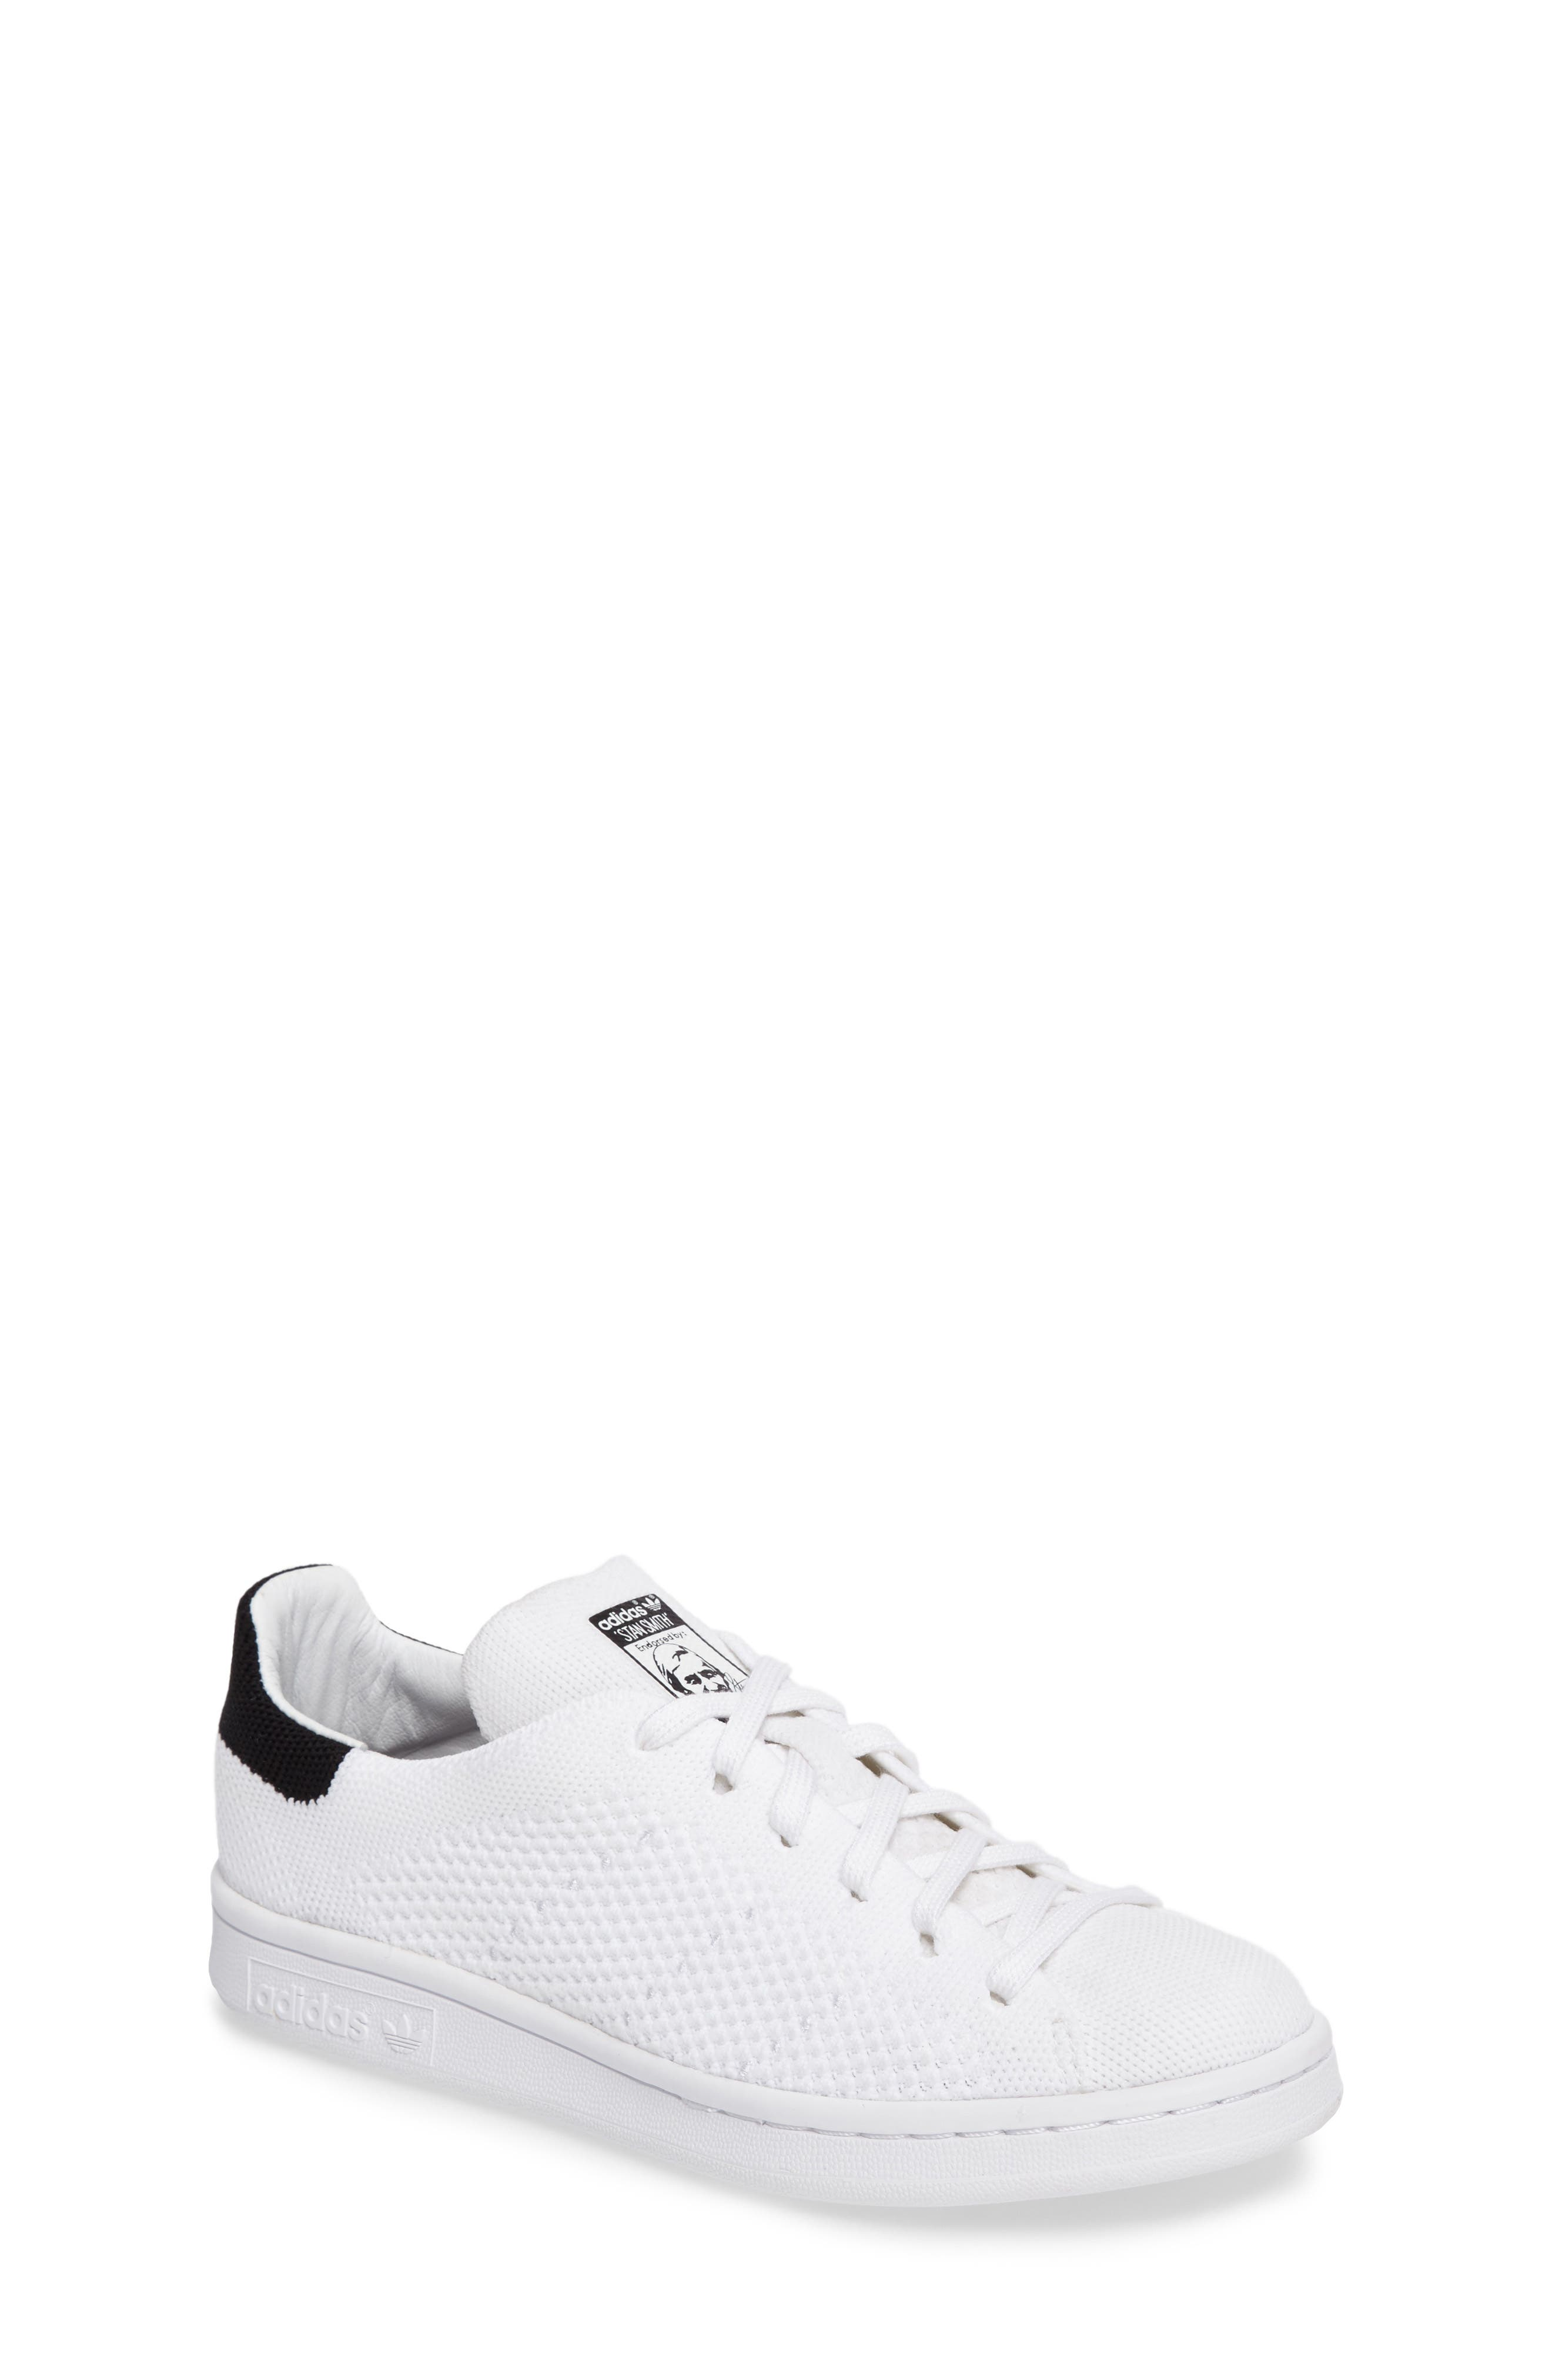 Alternate Image 1 Selected - adidas Stan Smith Primeknit Sneaker (Big Kid)